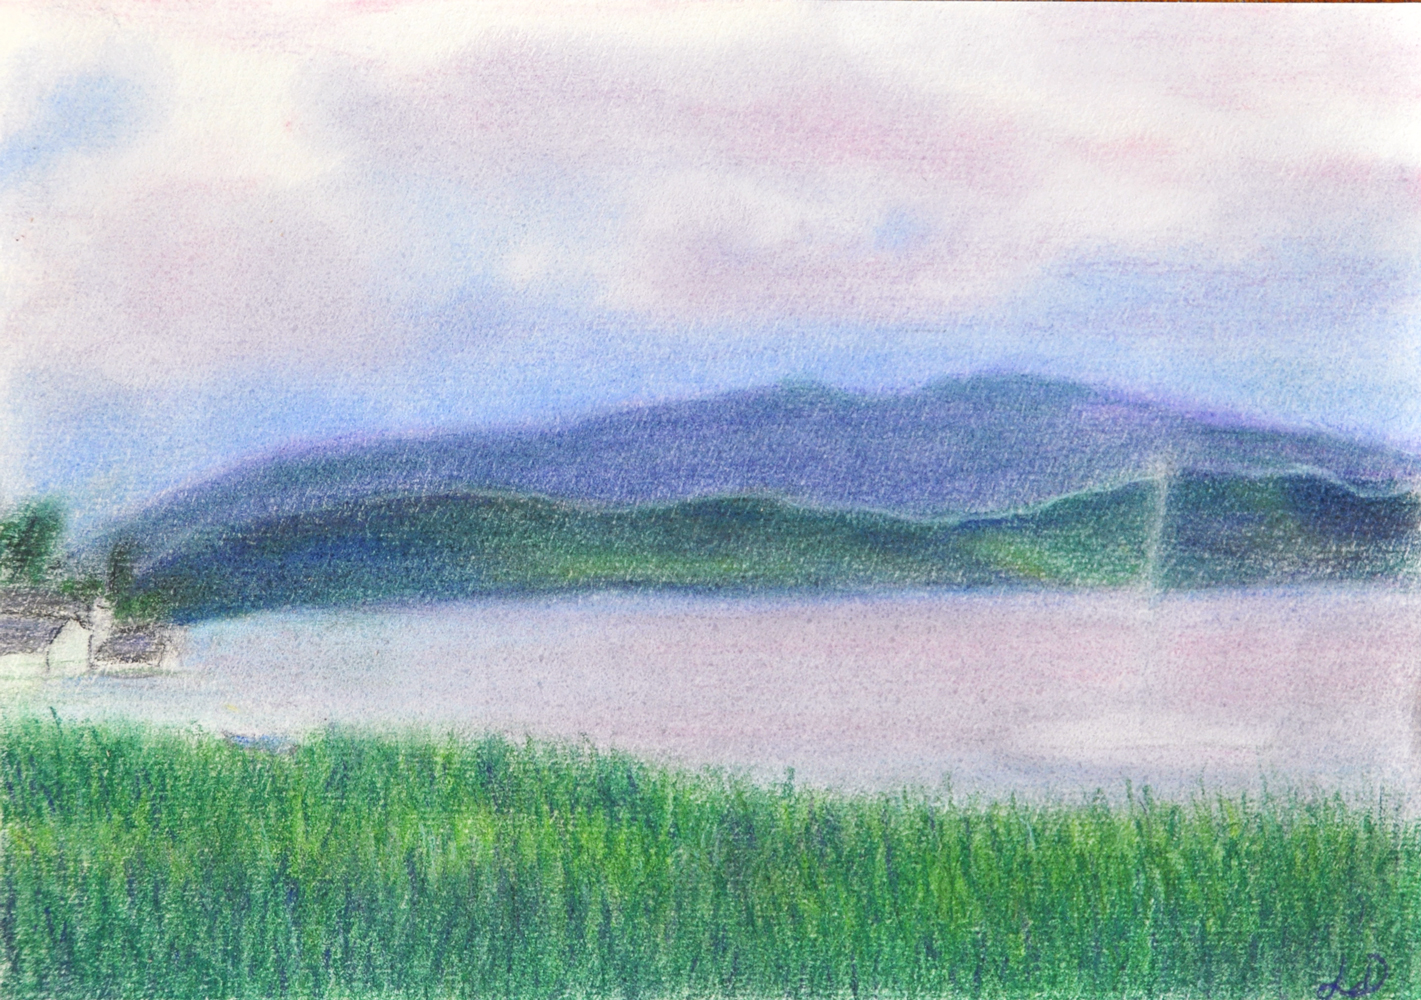 Lake Zurich no. 1. Dry pastel on paper. 15x21, 2013